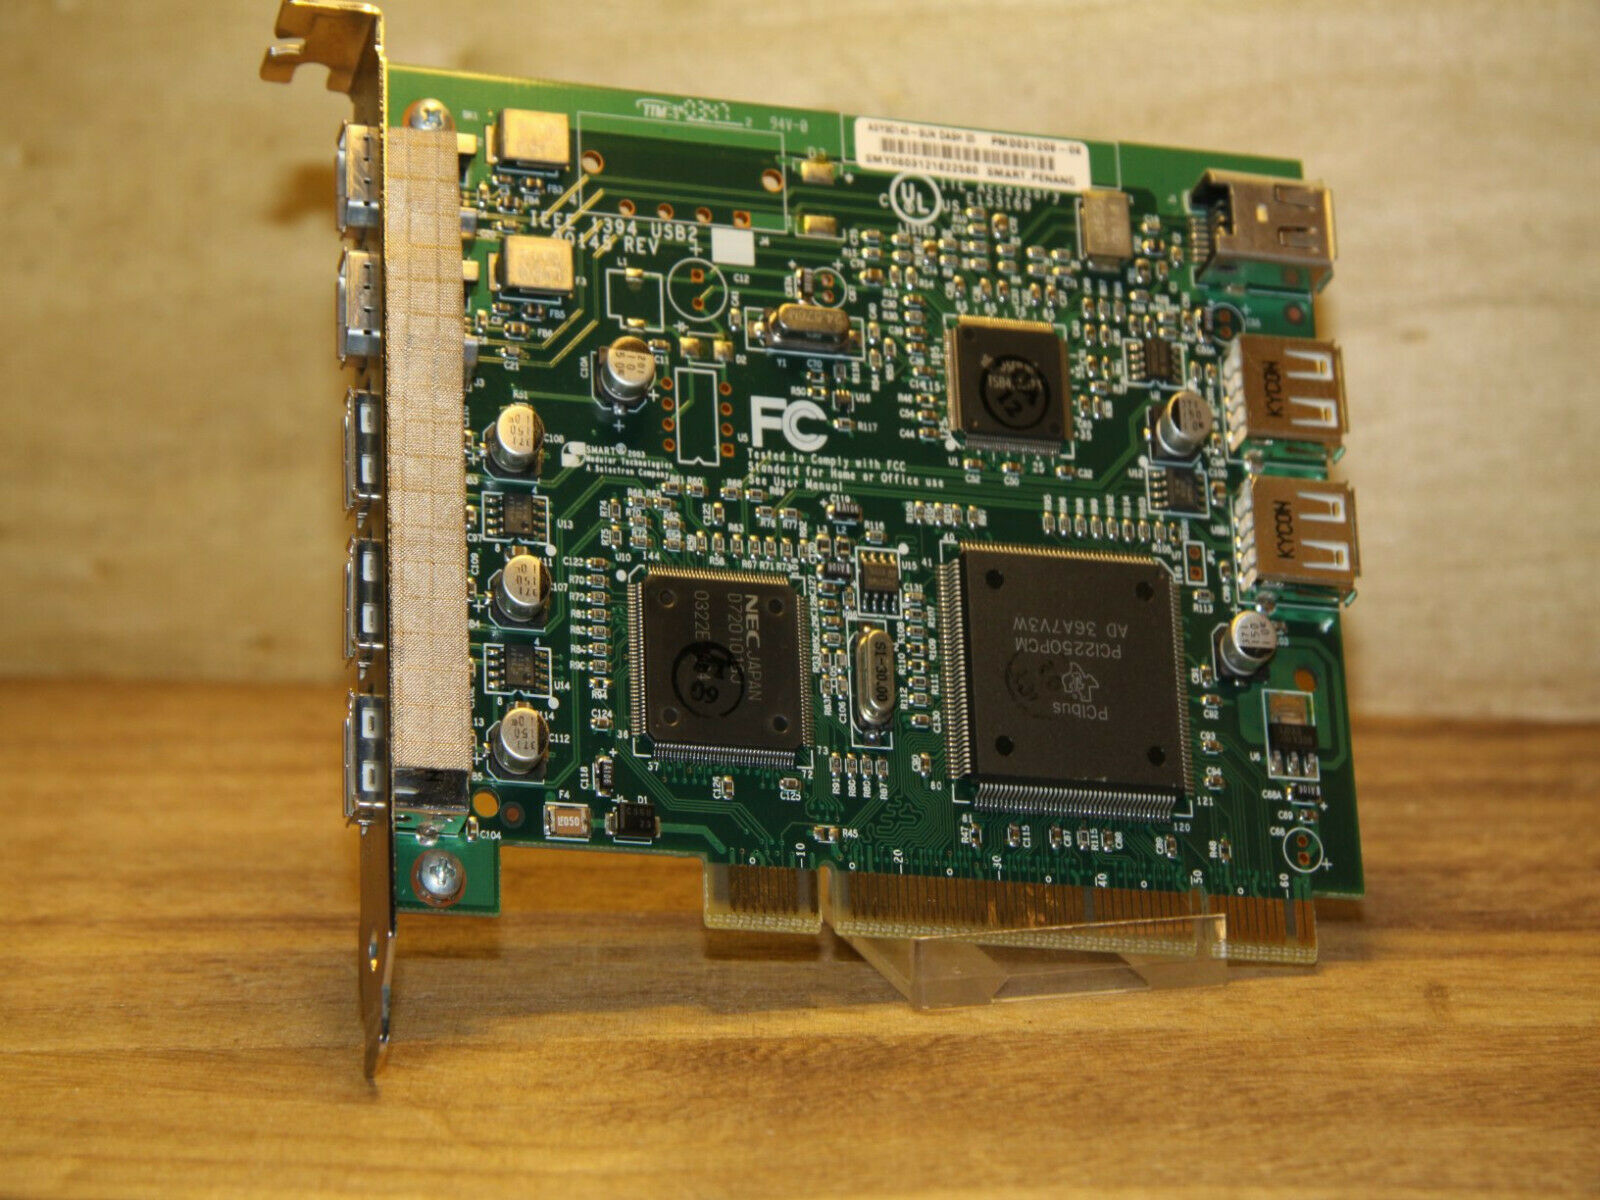 ✔️⚙️ WORKING SUN 375-3140-05 USB FIREWIRE COMBO PCI CARD - UK SELLER